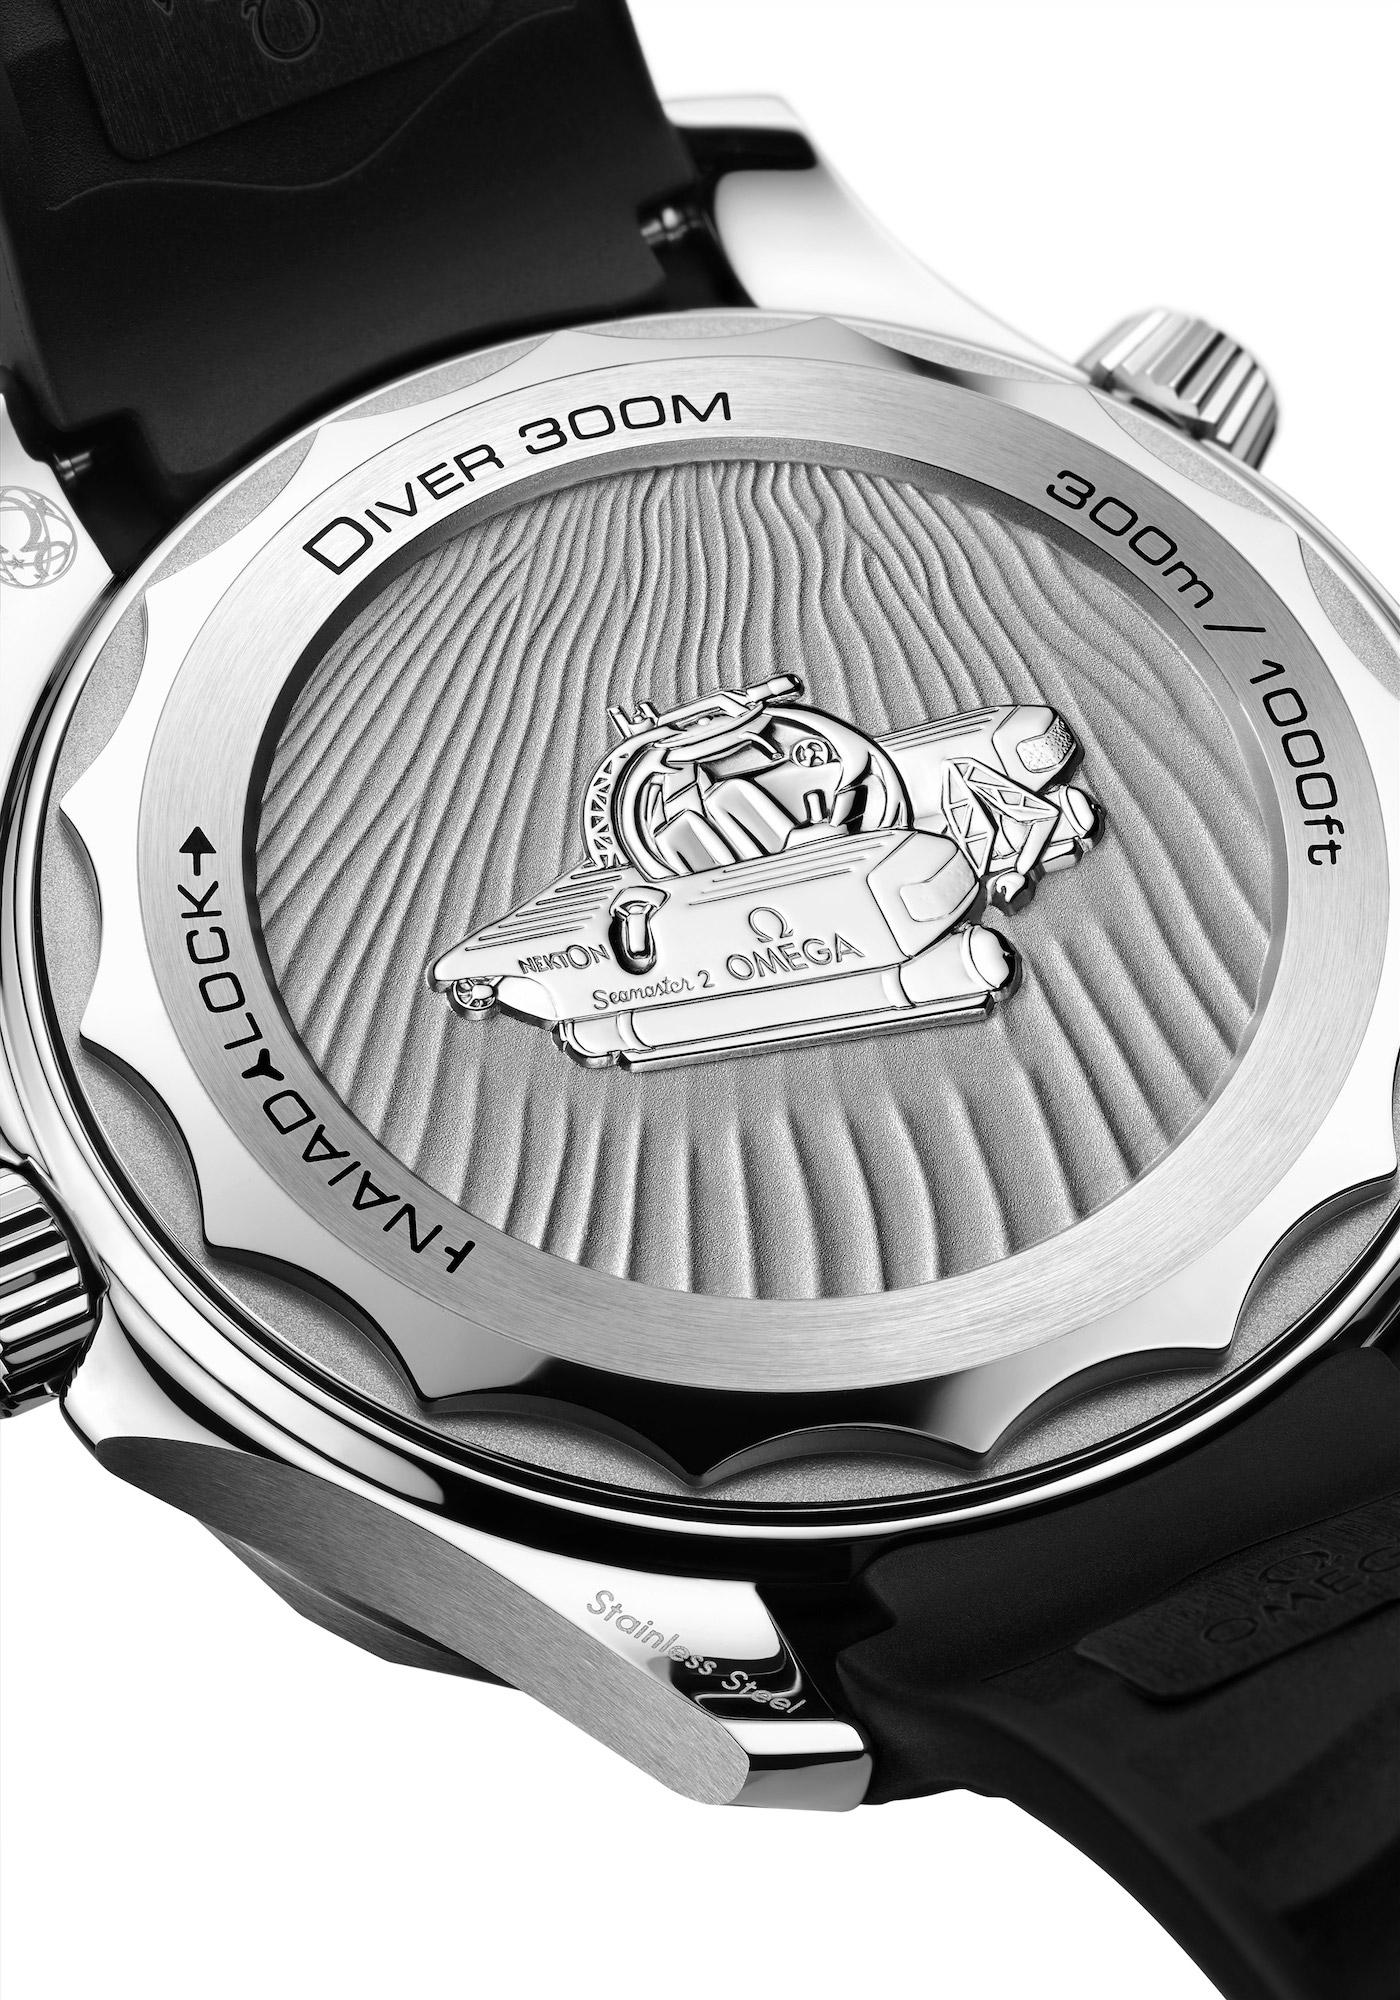 Omega Seamaster Diver 300M Nekton Edition 210.32.42.20.01.002 detalle trasera